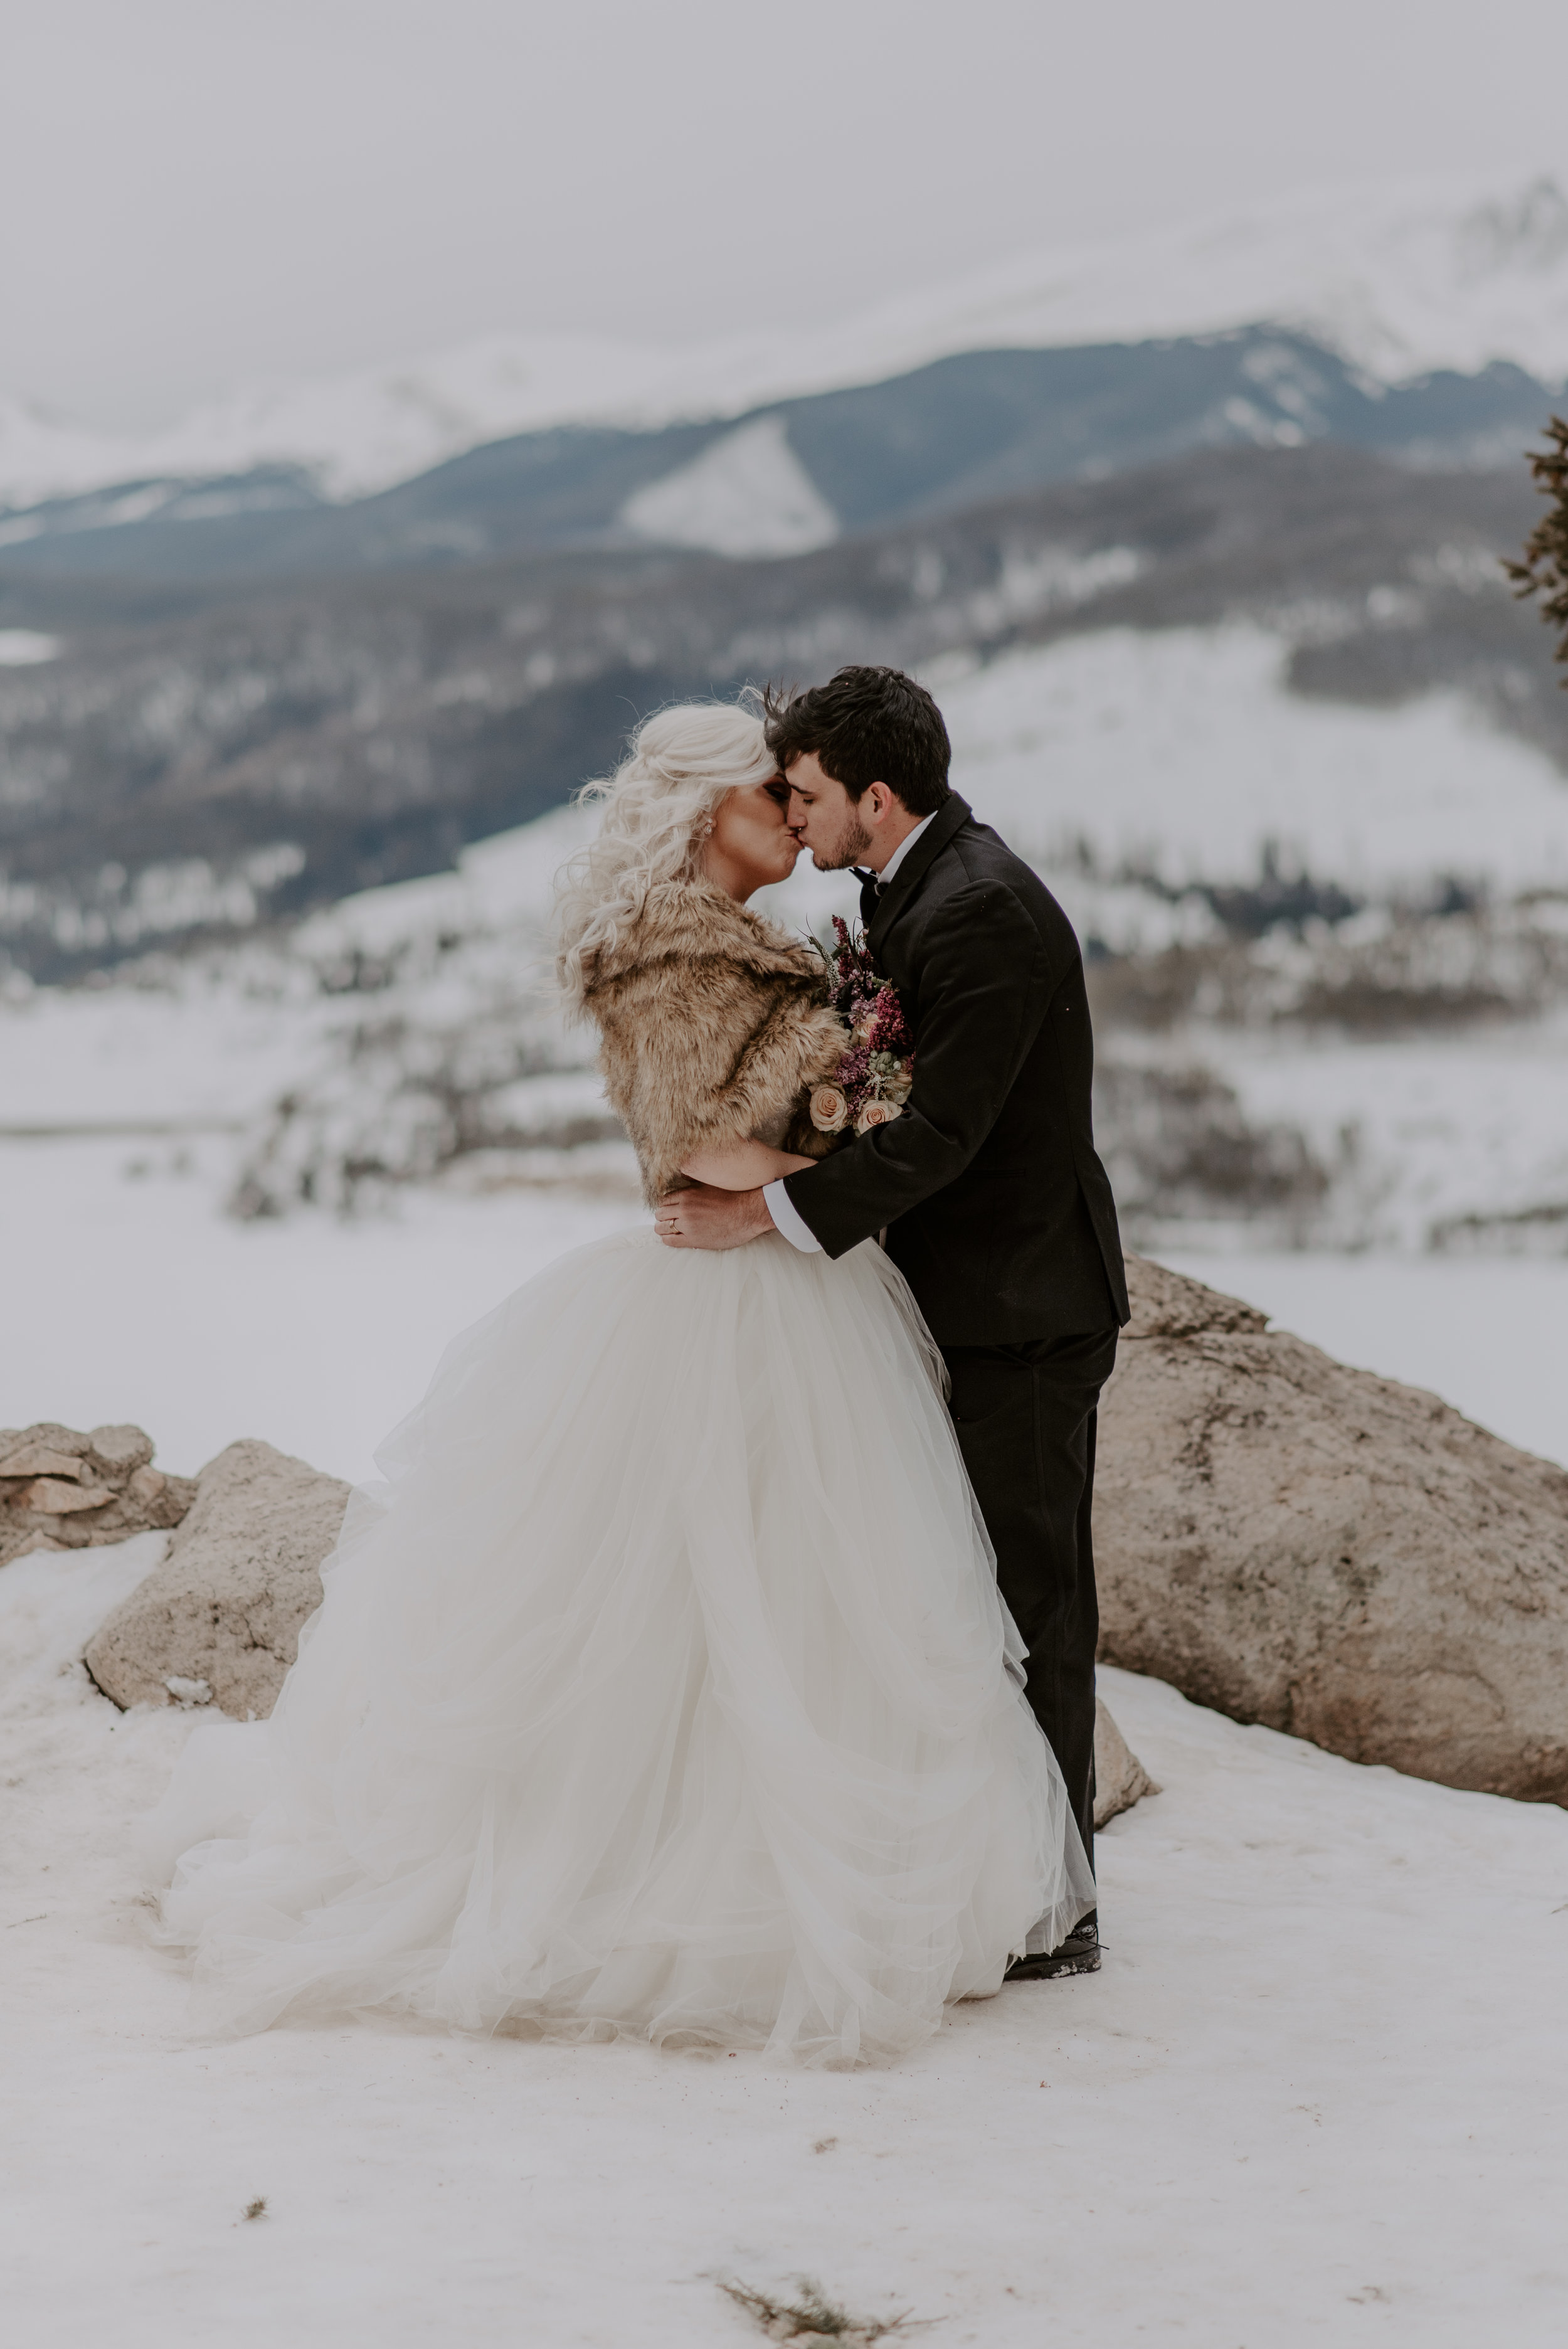 Destination adventure elopement at Sapphire Point in Colorado.